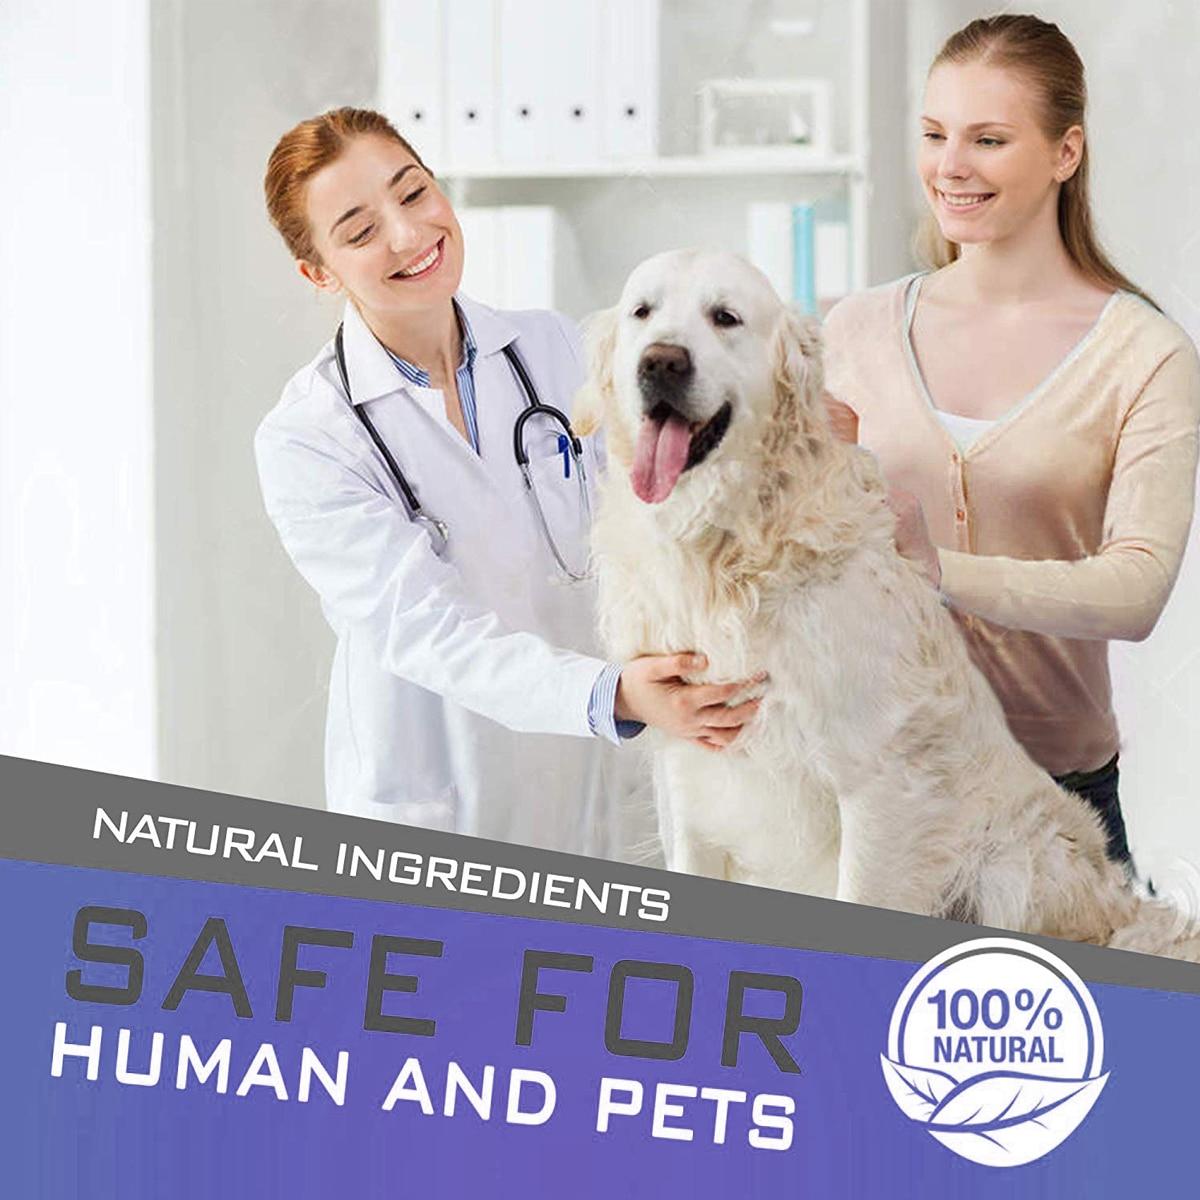 Dewel Anti Flea Ticks Insect Mosquitoes 8 Months Protection Waterproof Long Lasting Dog Collar Custom Puppy Cat Pet Collars